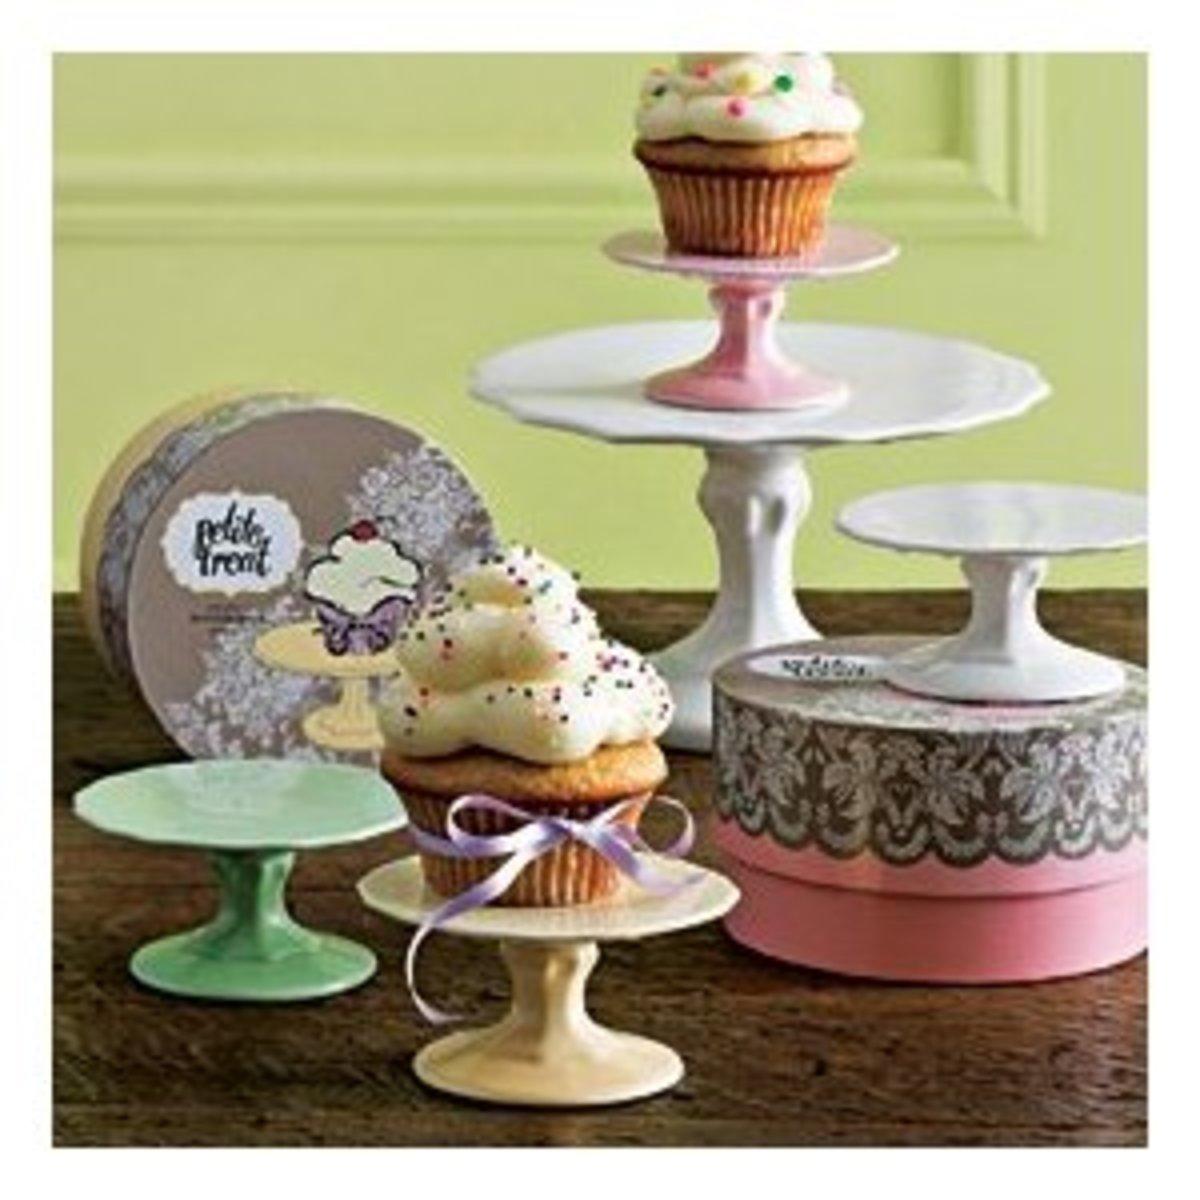 petit-treat-cupcake-stand